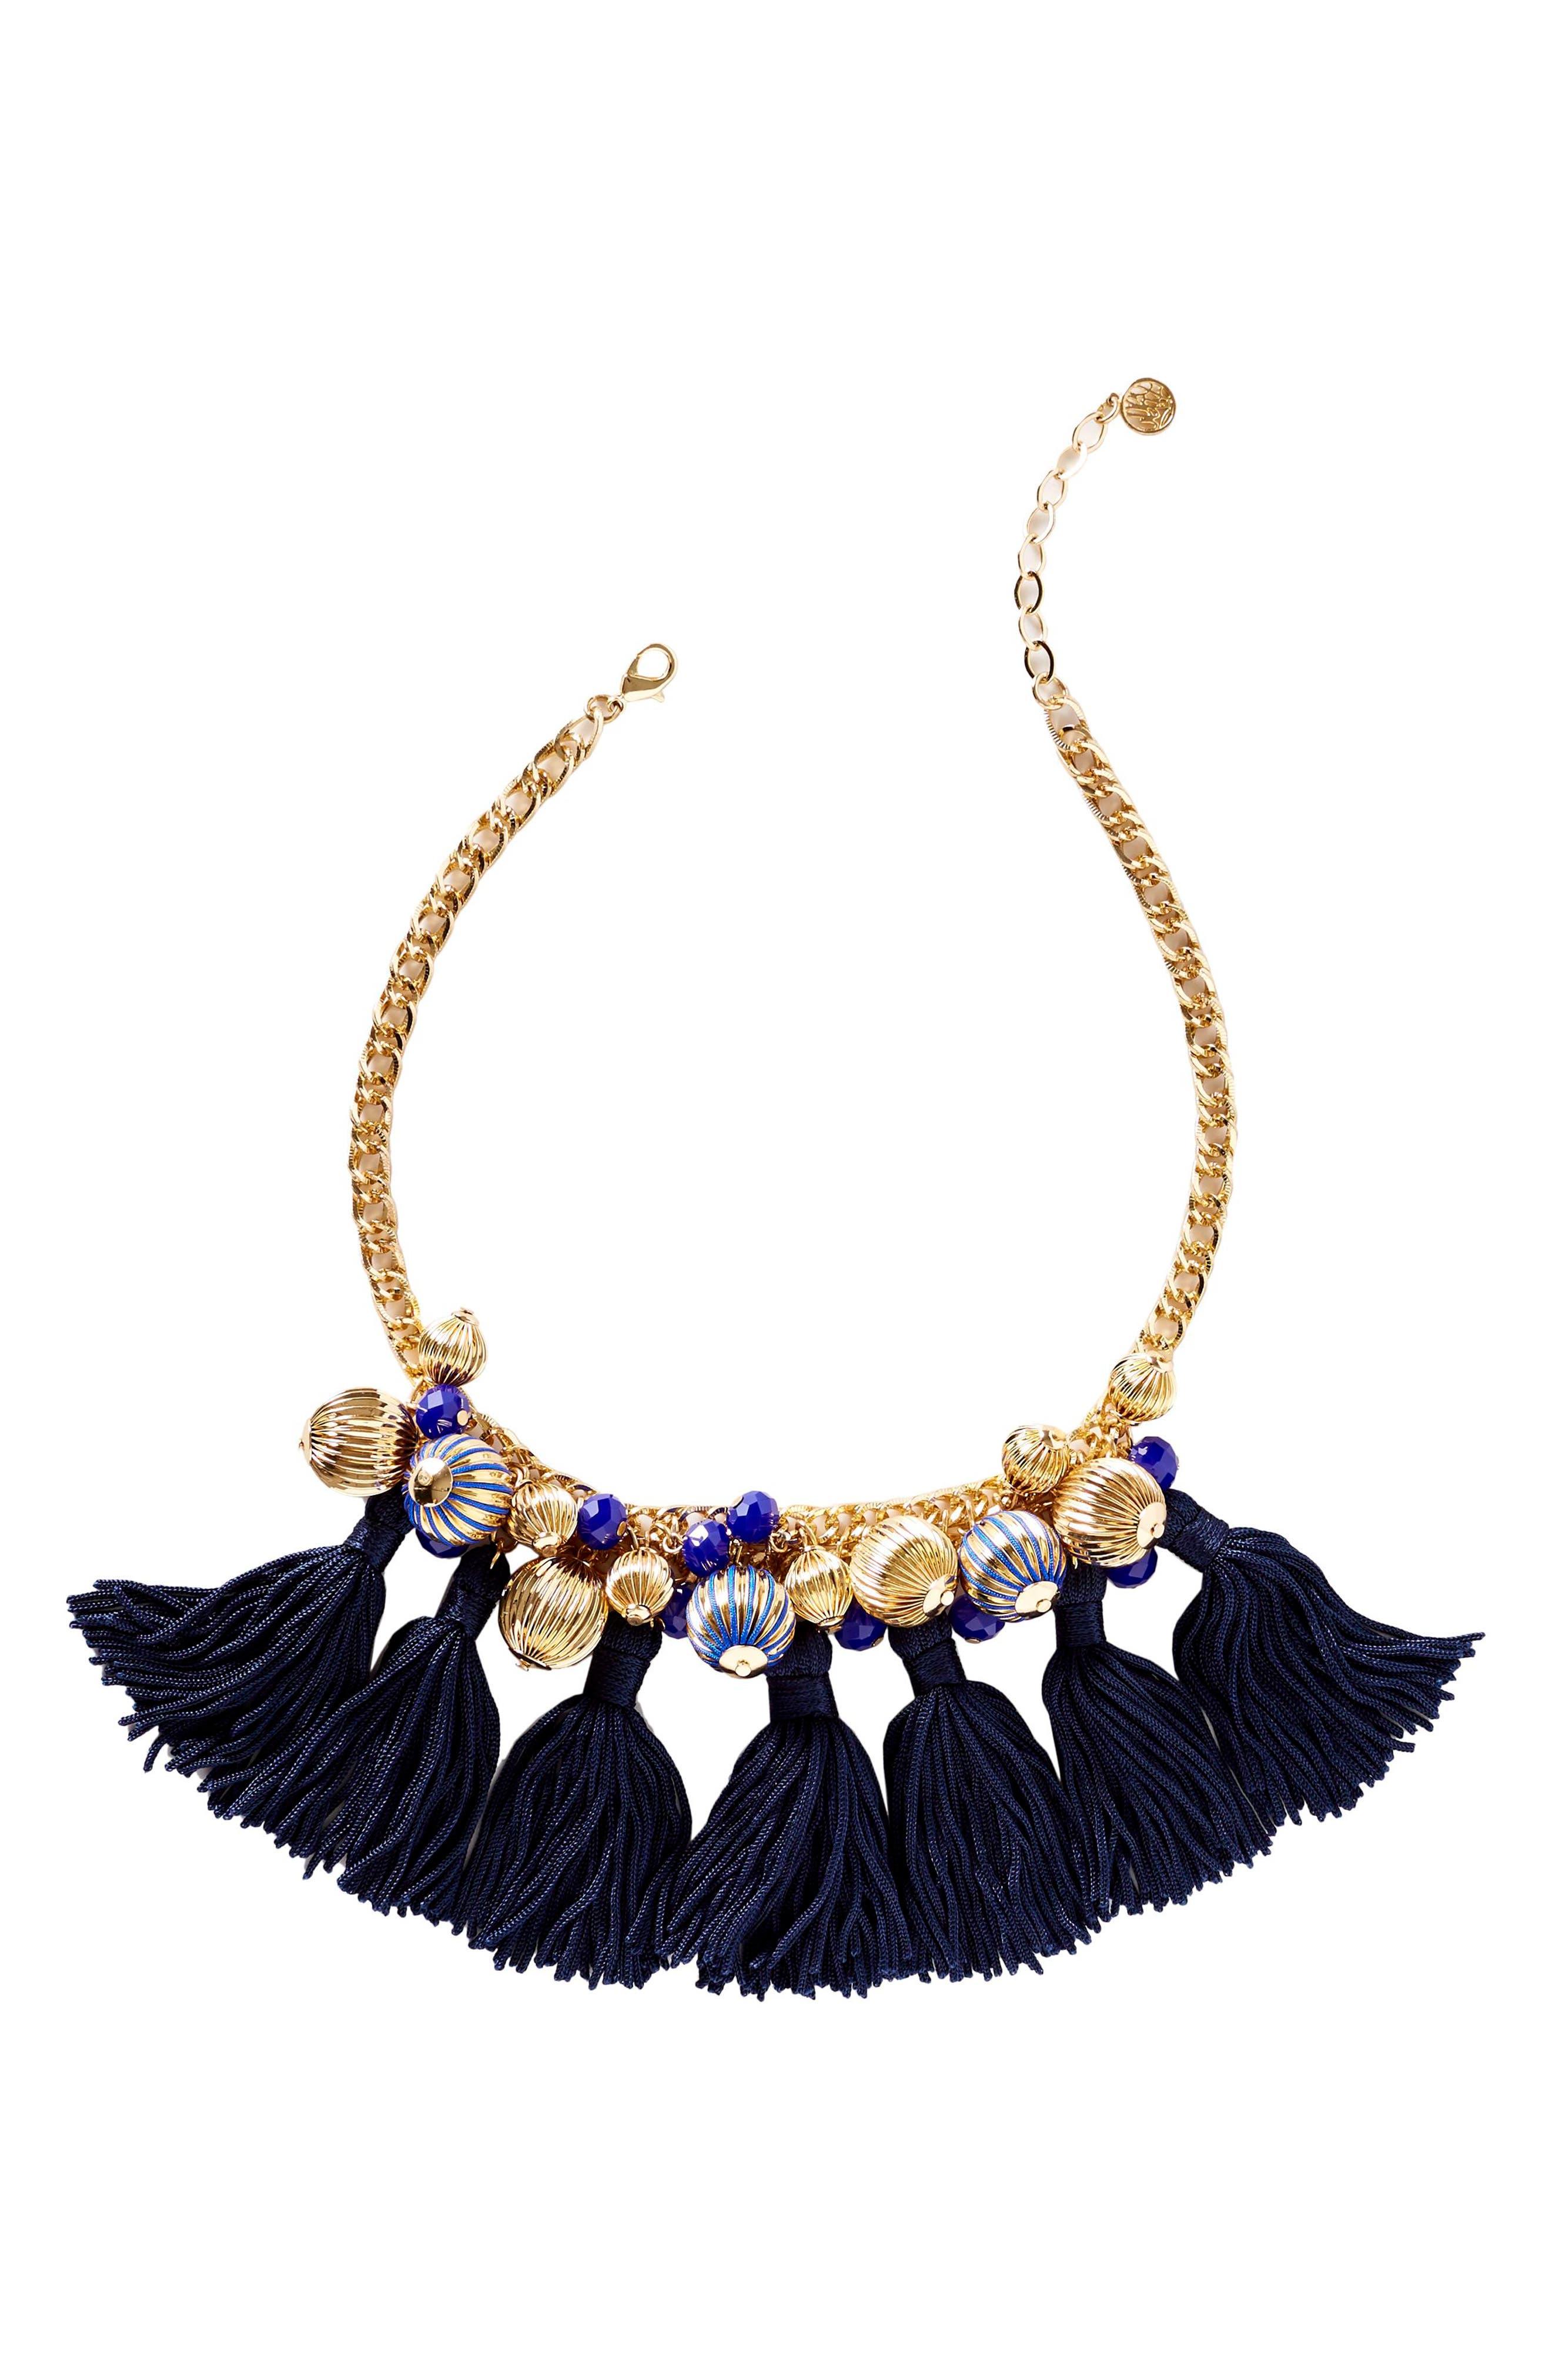 Main Image - Lilly Pulitzer® Fringe Collar Necklace